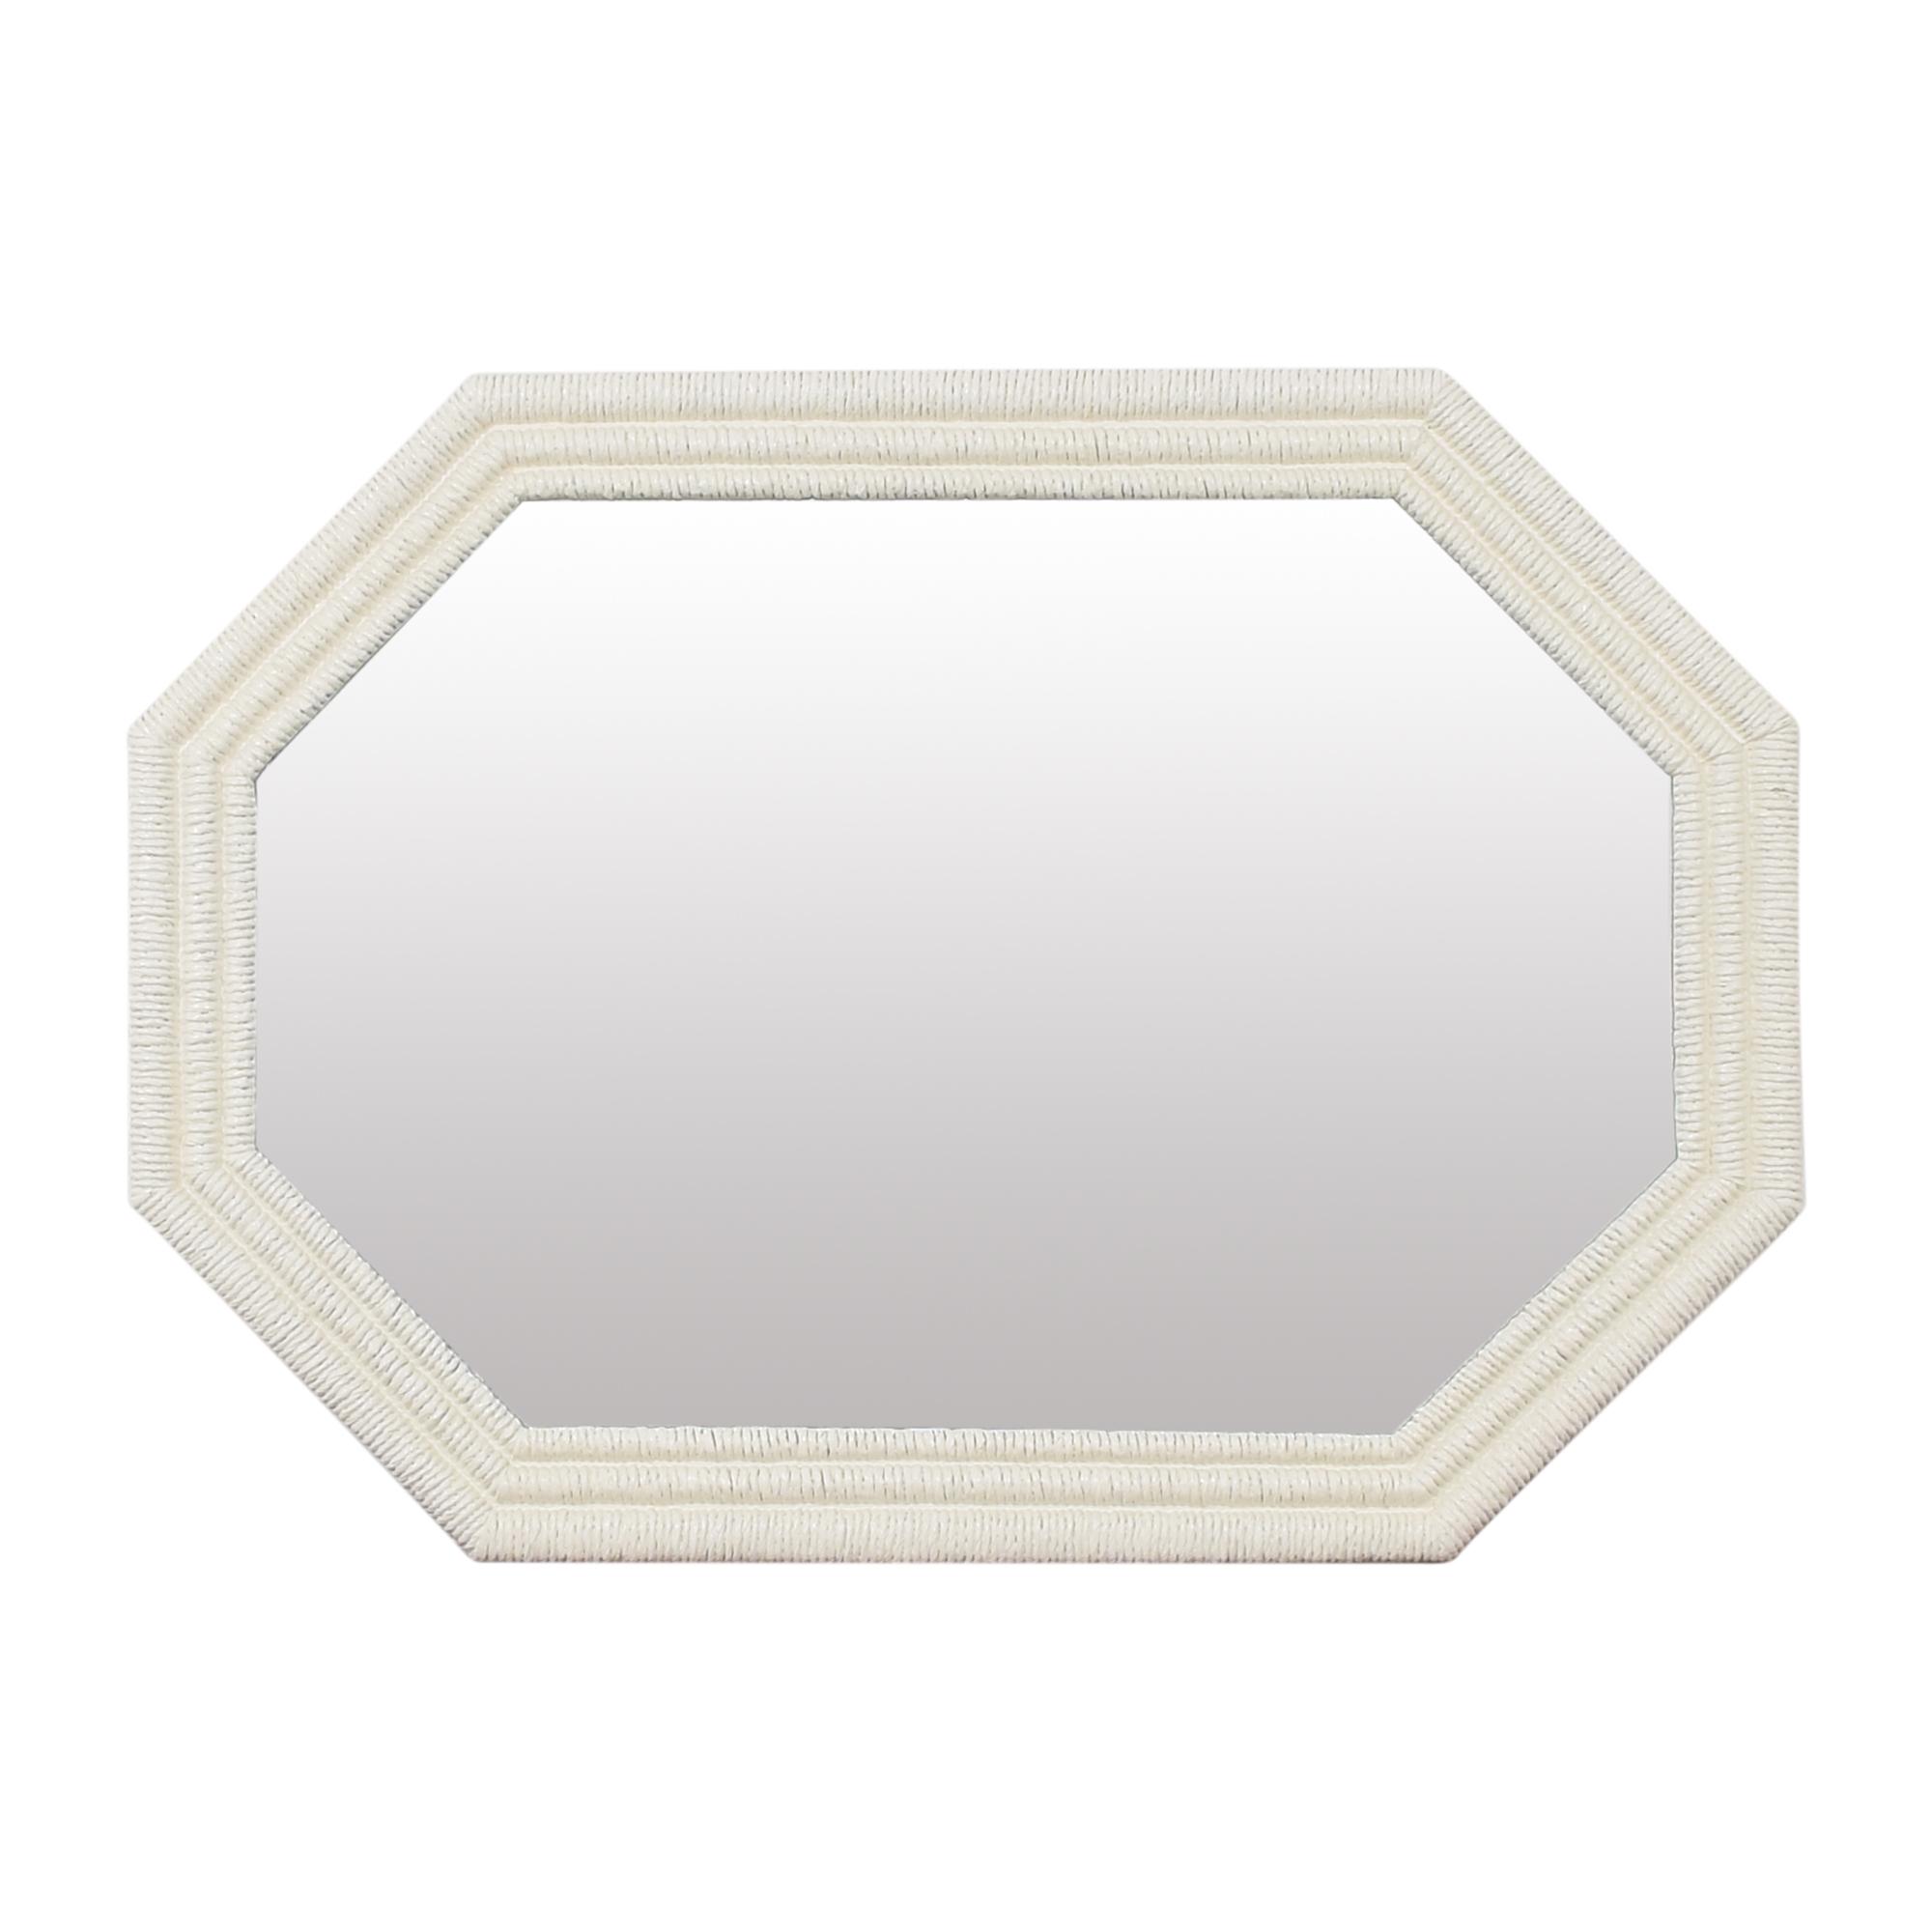 Bassett Furniture Bassett Octagonal Wall Mirror on sale